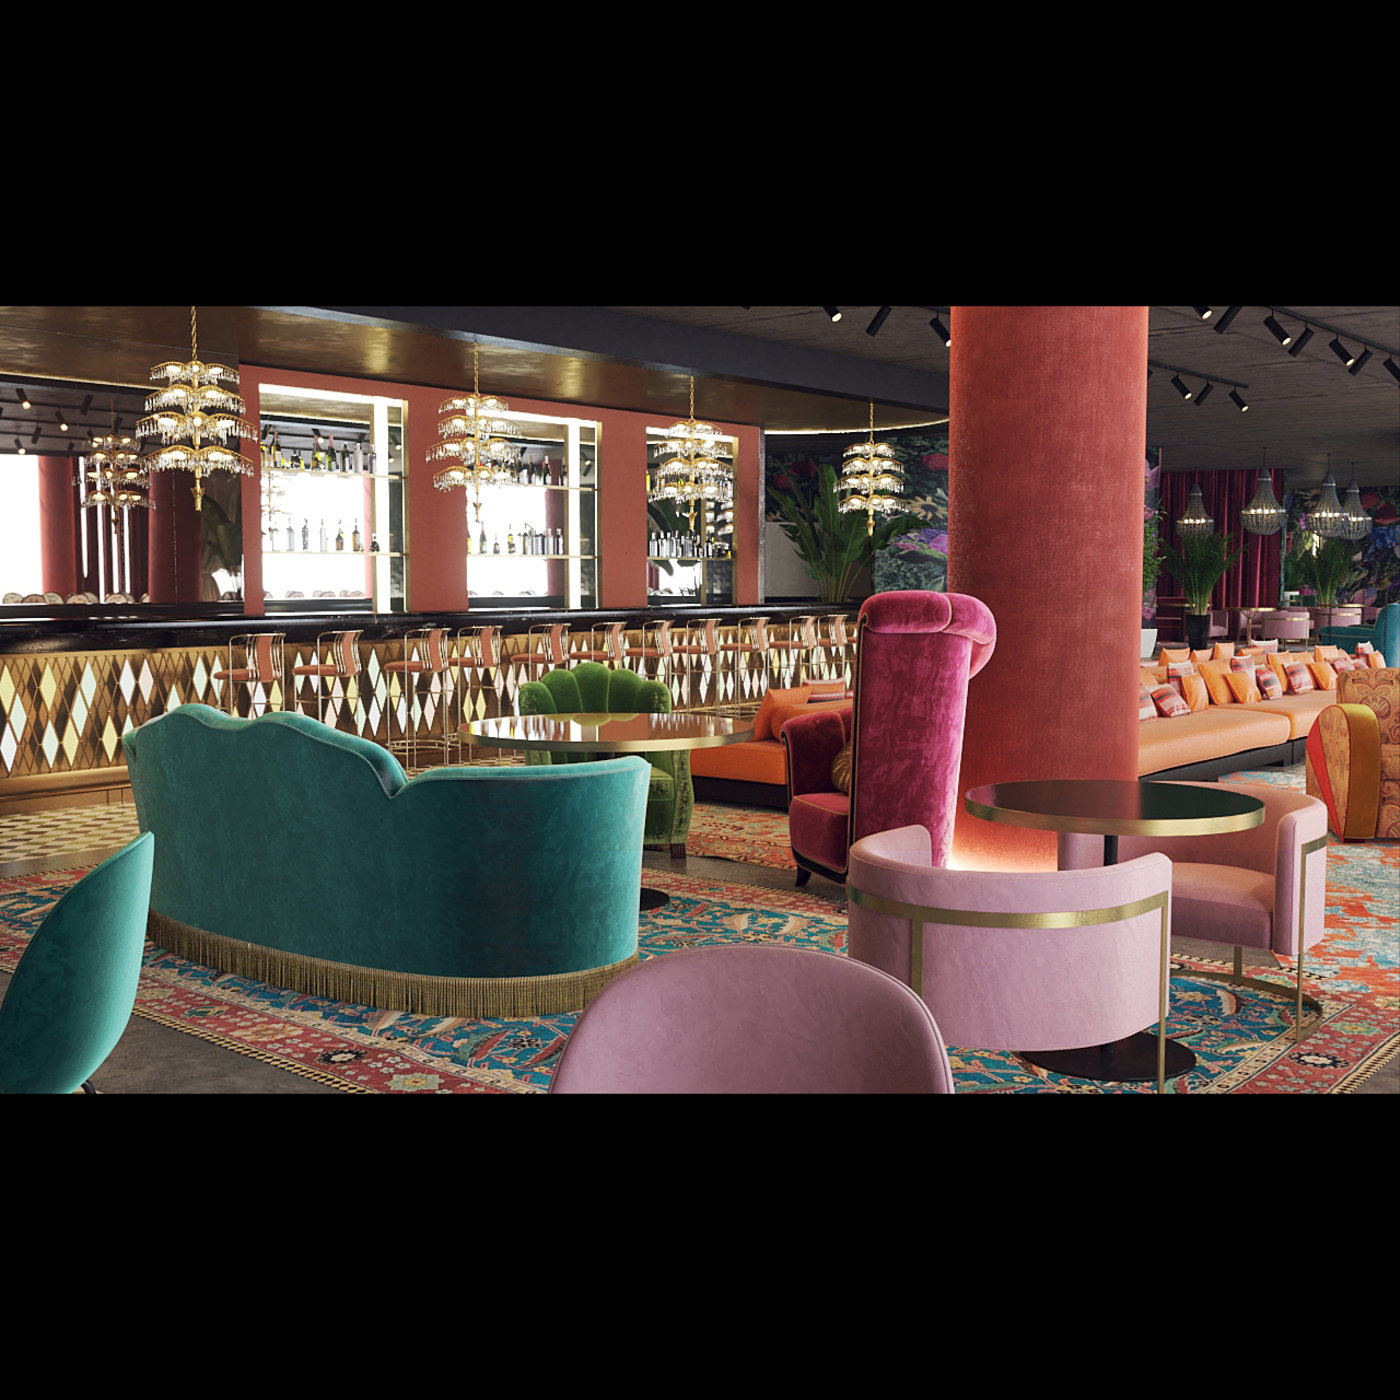 Restaurant interior - Event Hall